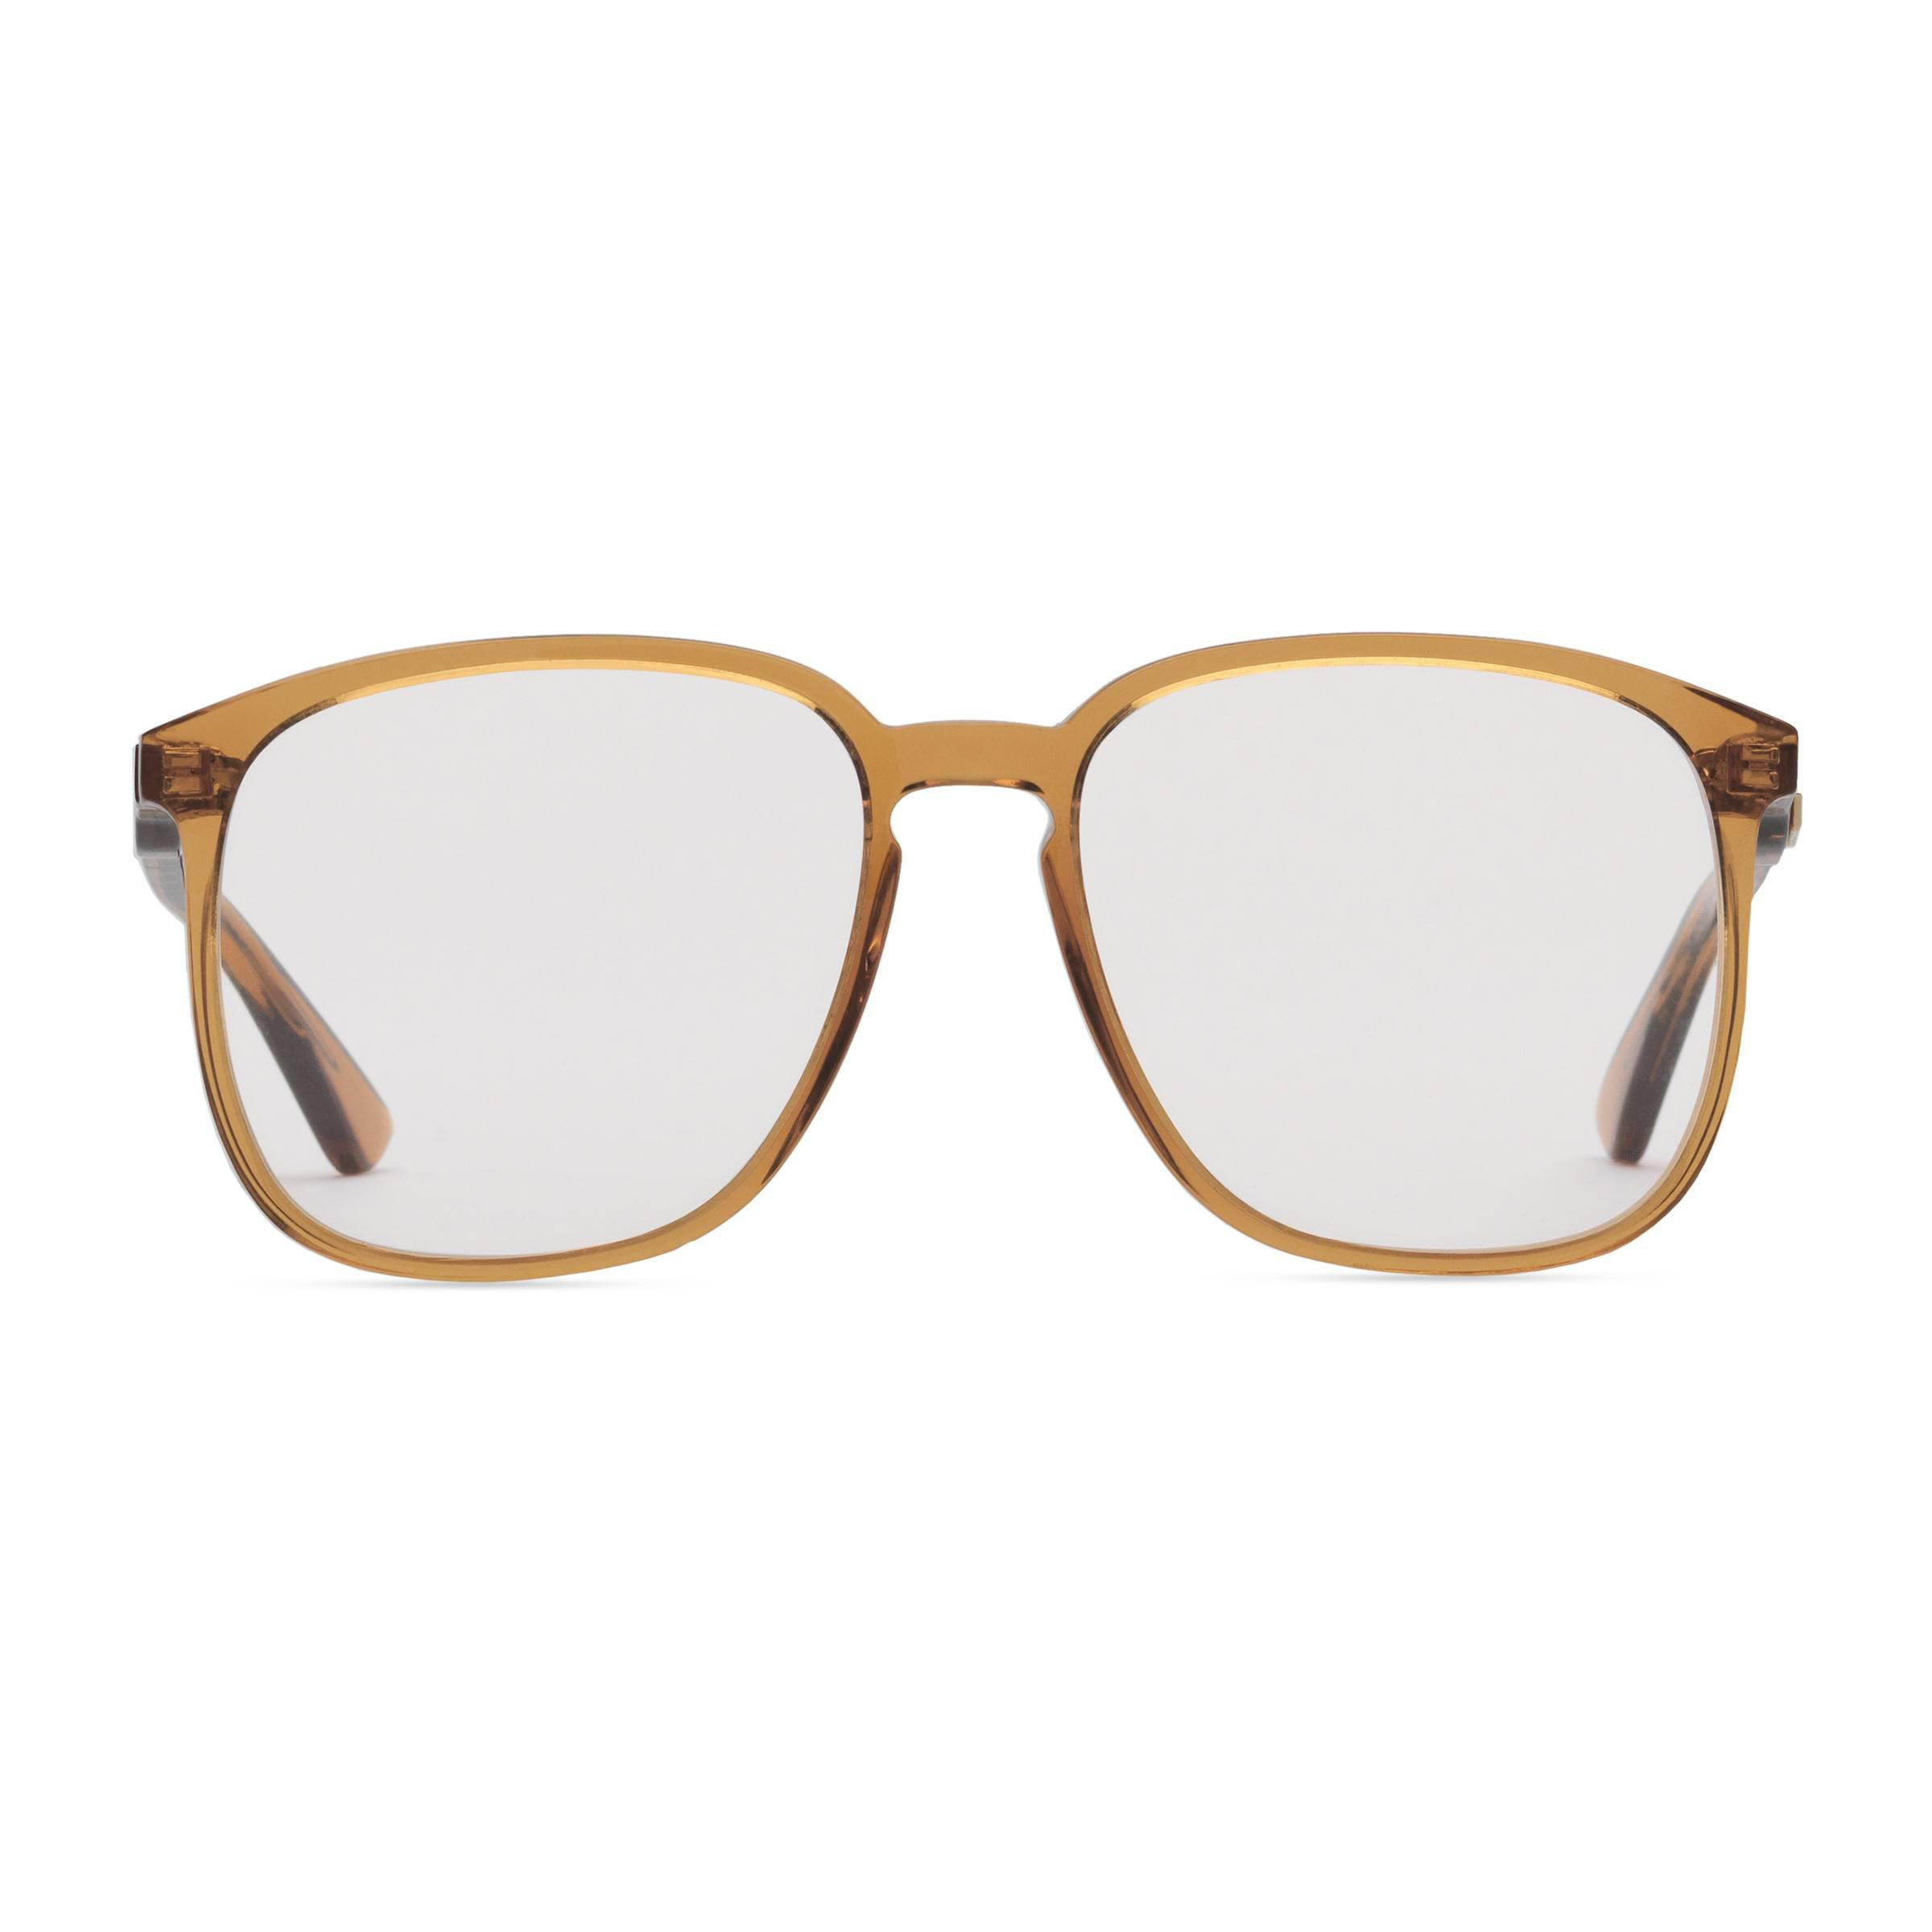 bd6bb399aa1a4 Gucci Square-frame Acetate Glasses in Orange - Lyst